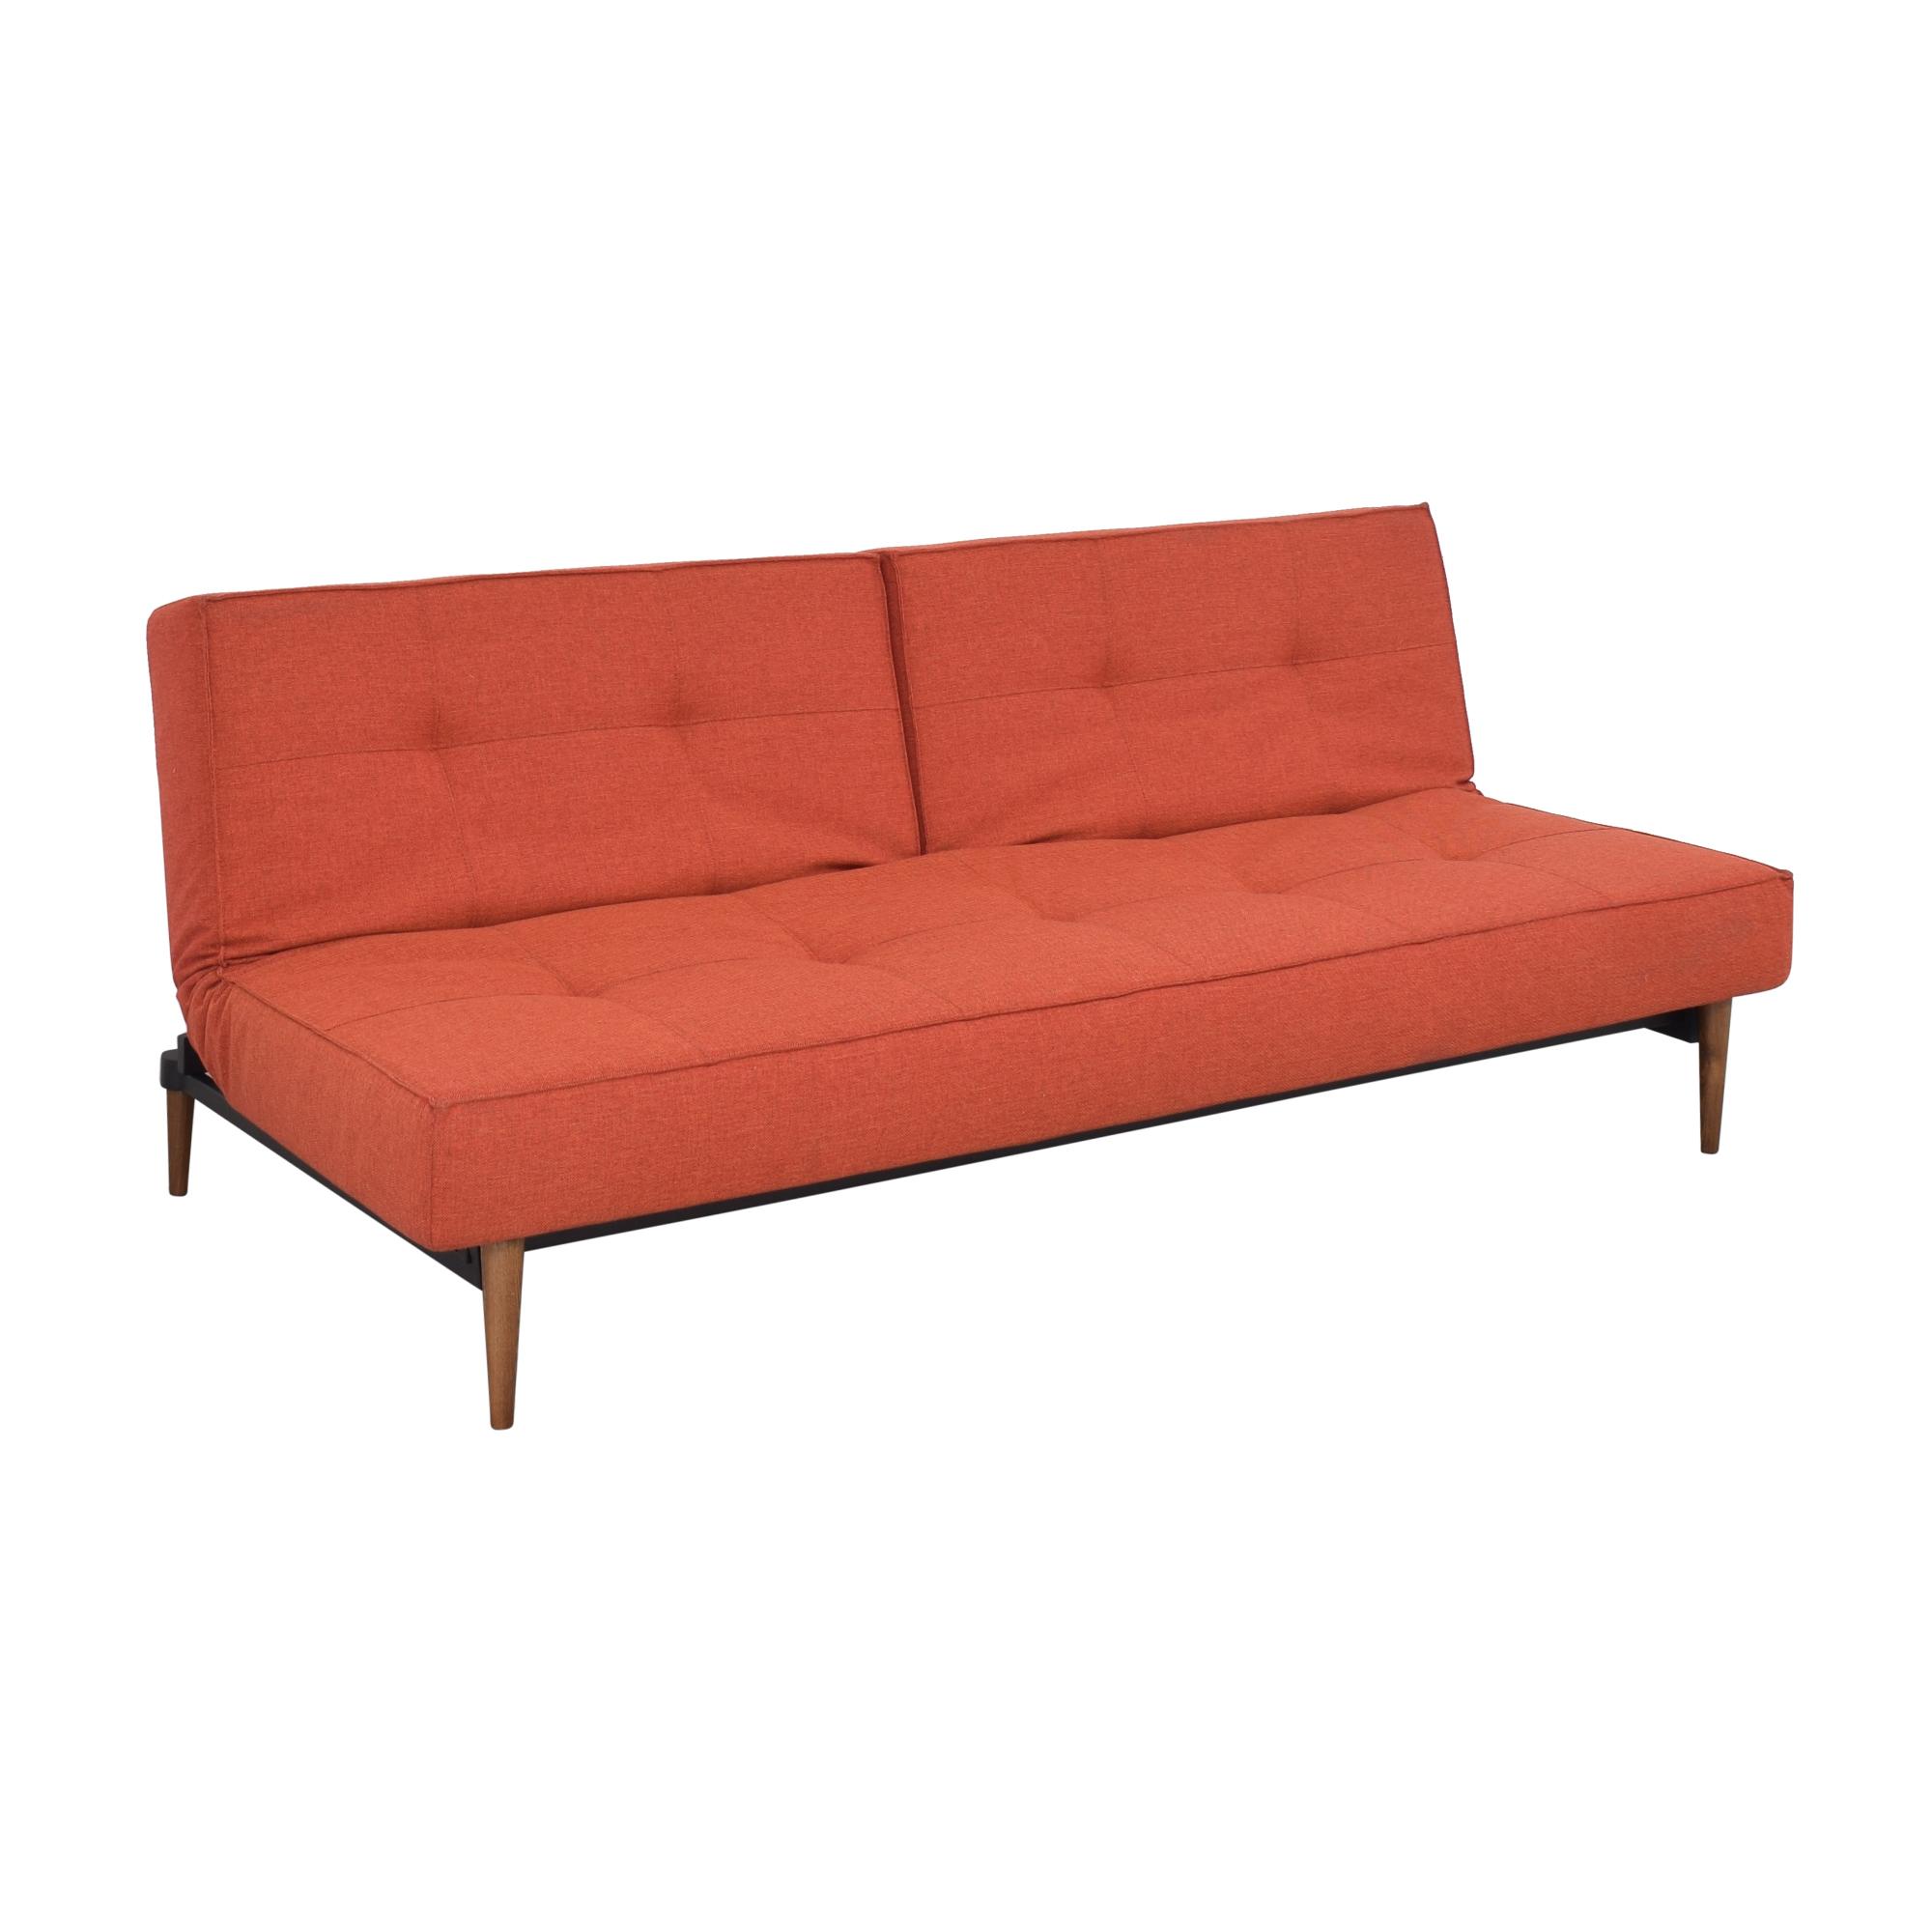 Innovation Living Innovation Living Splitback Convertible Sofa Bed red